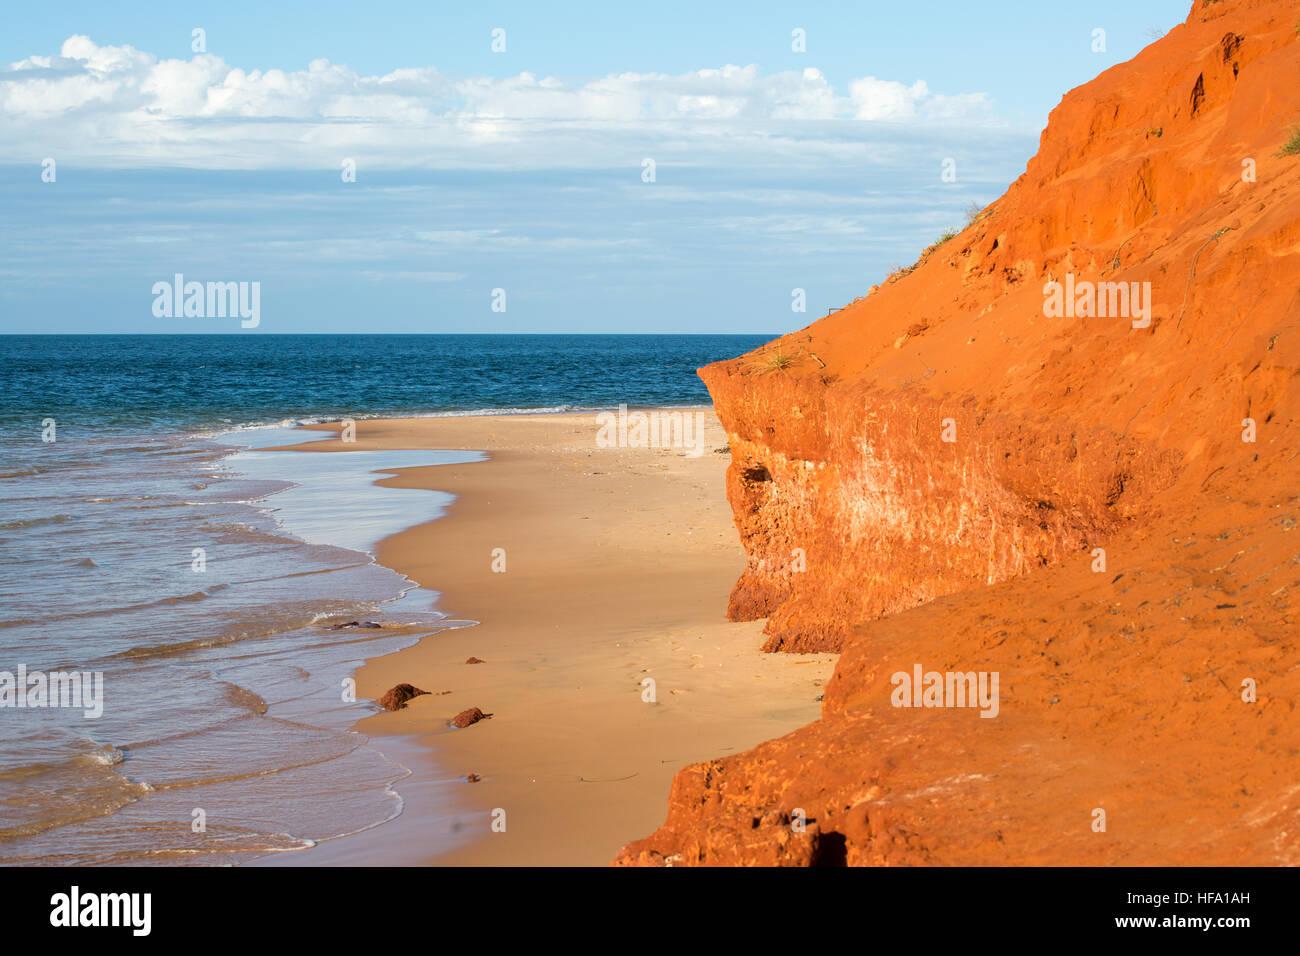 Francois Peron National Park, Western Australia - Stock Image